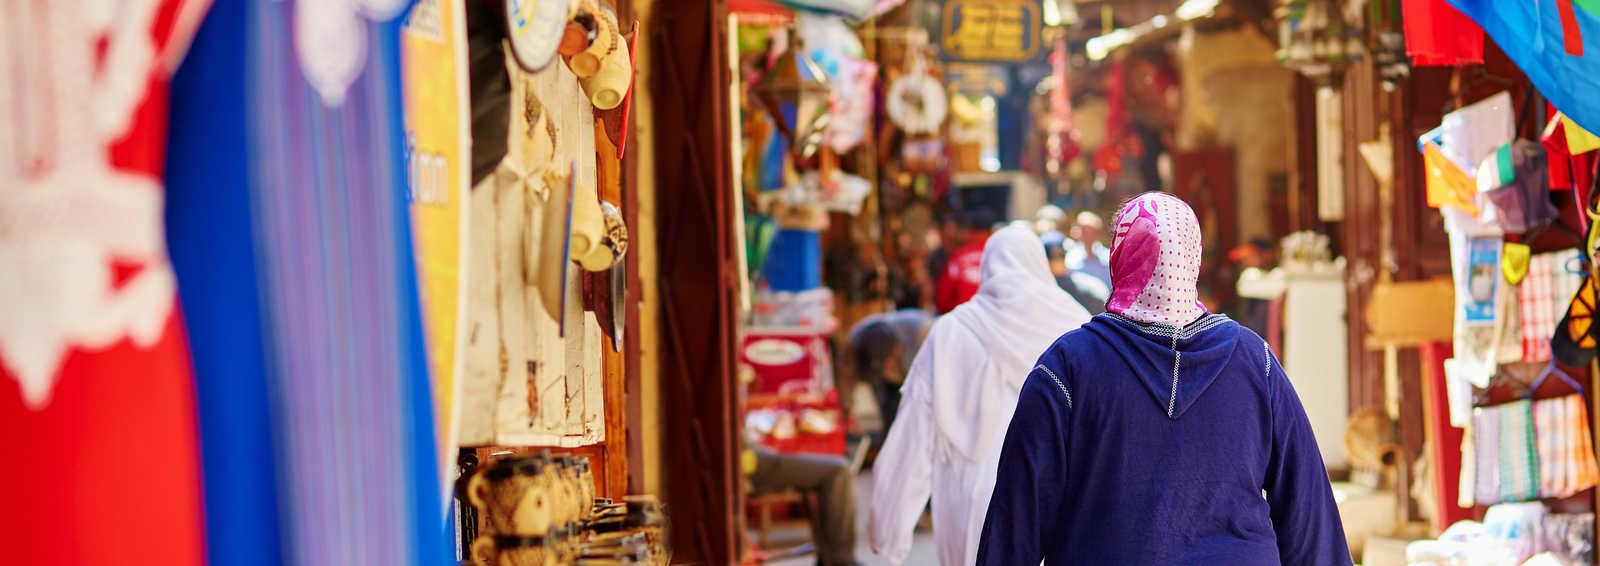 Women shopping in the Souk, Fez, Morocco